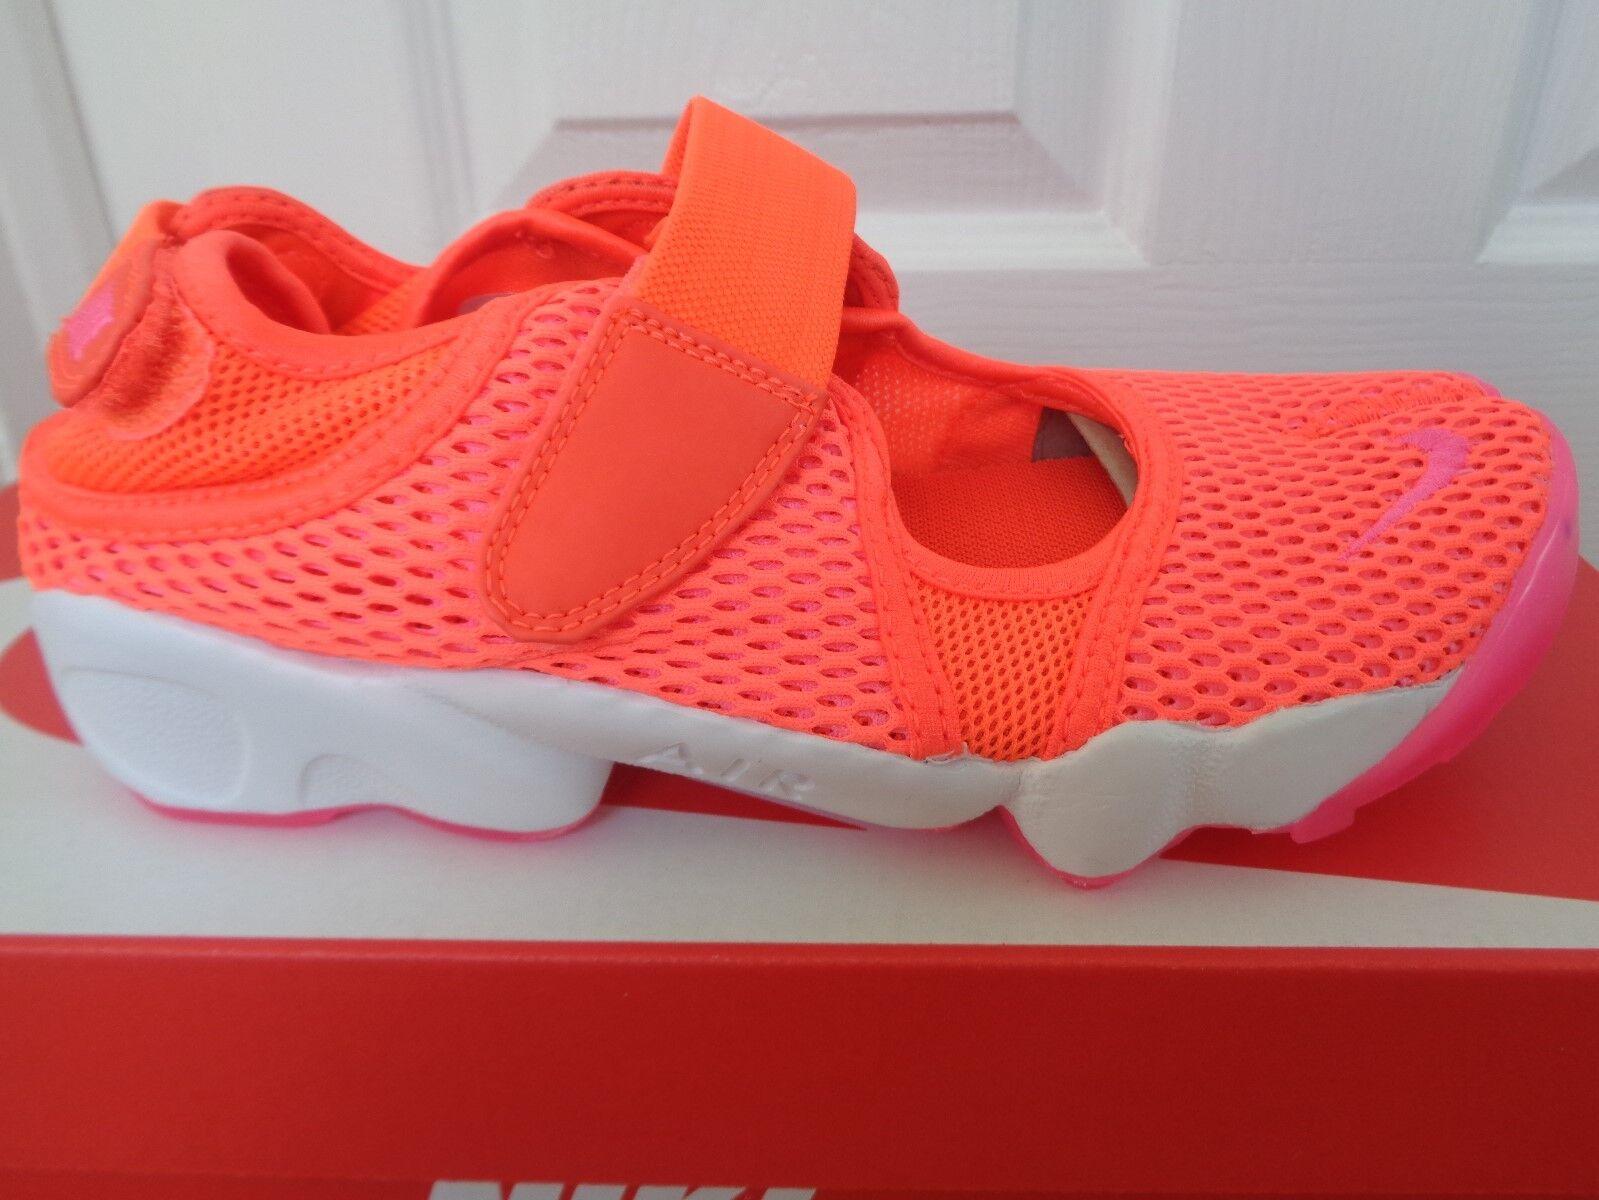 Nike trainers Air Rift BR Femme trainers Nike chaussures 848386 800 uk 4.5 eu 38 us 7 NEWBOX d44d55